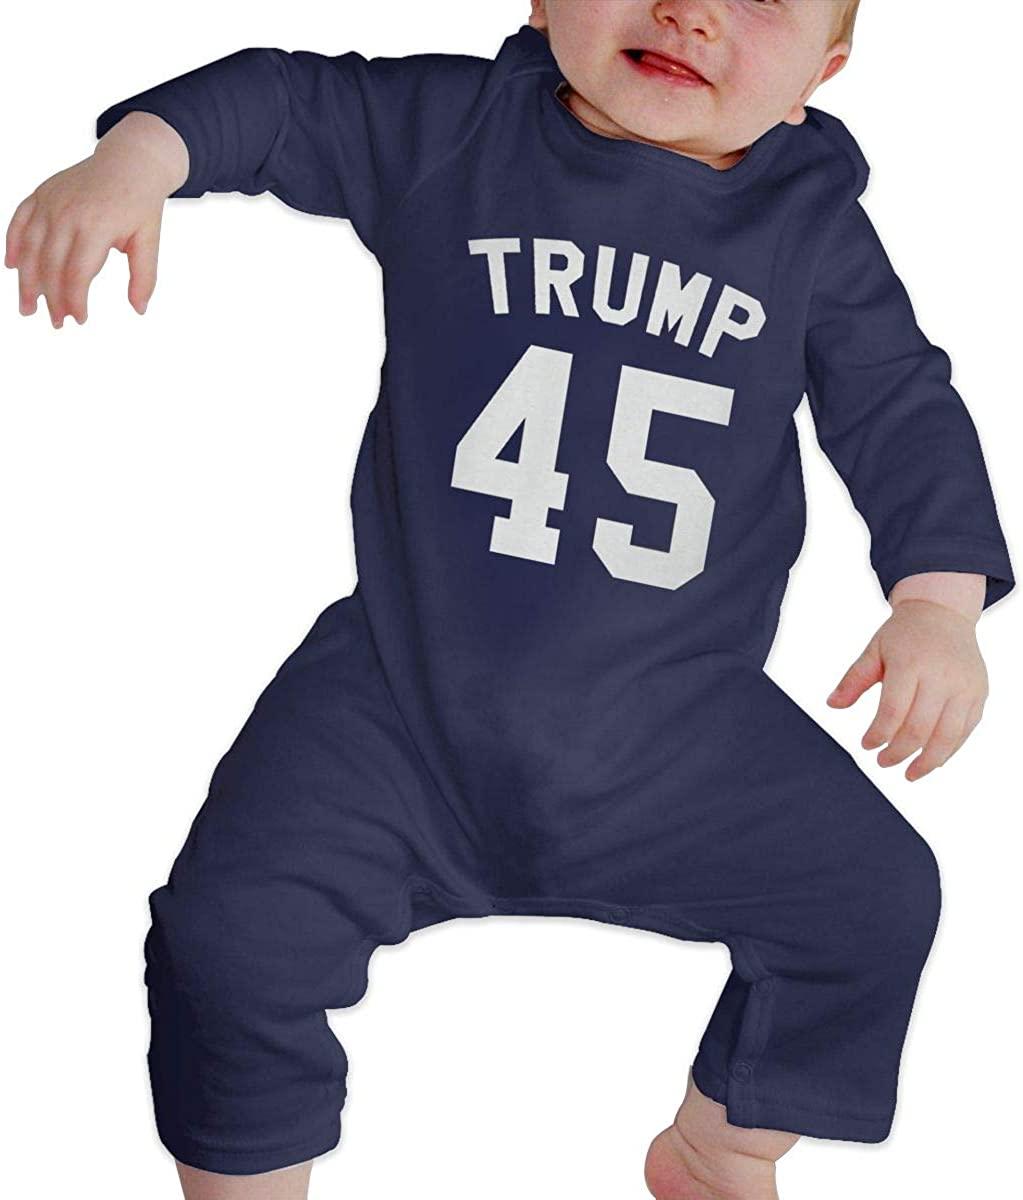 Sherrygeoffrey Trump 45 Jersey Baby Bodysuit Jumpsuit Long Sleeve Infant Navy